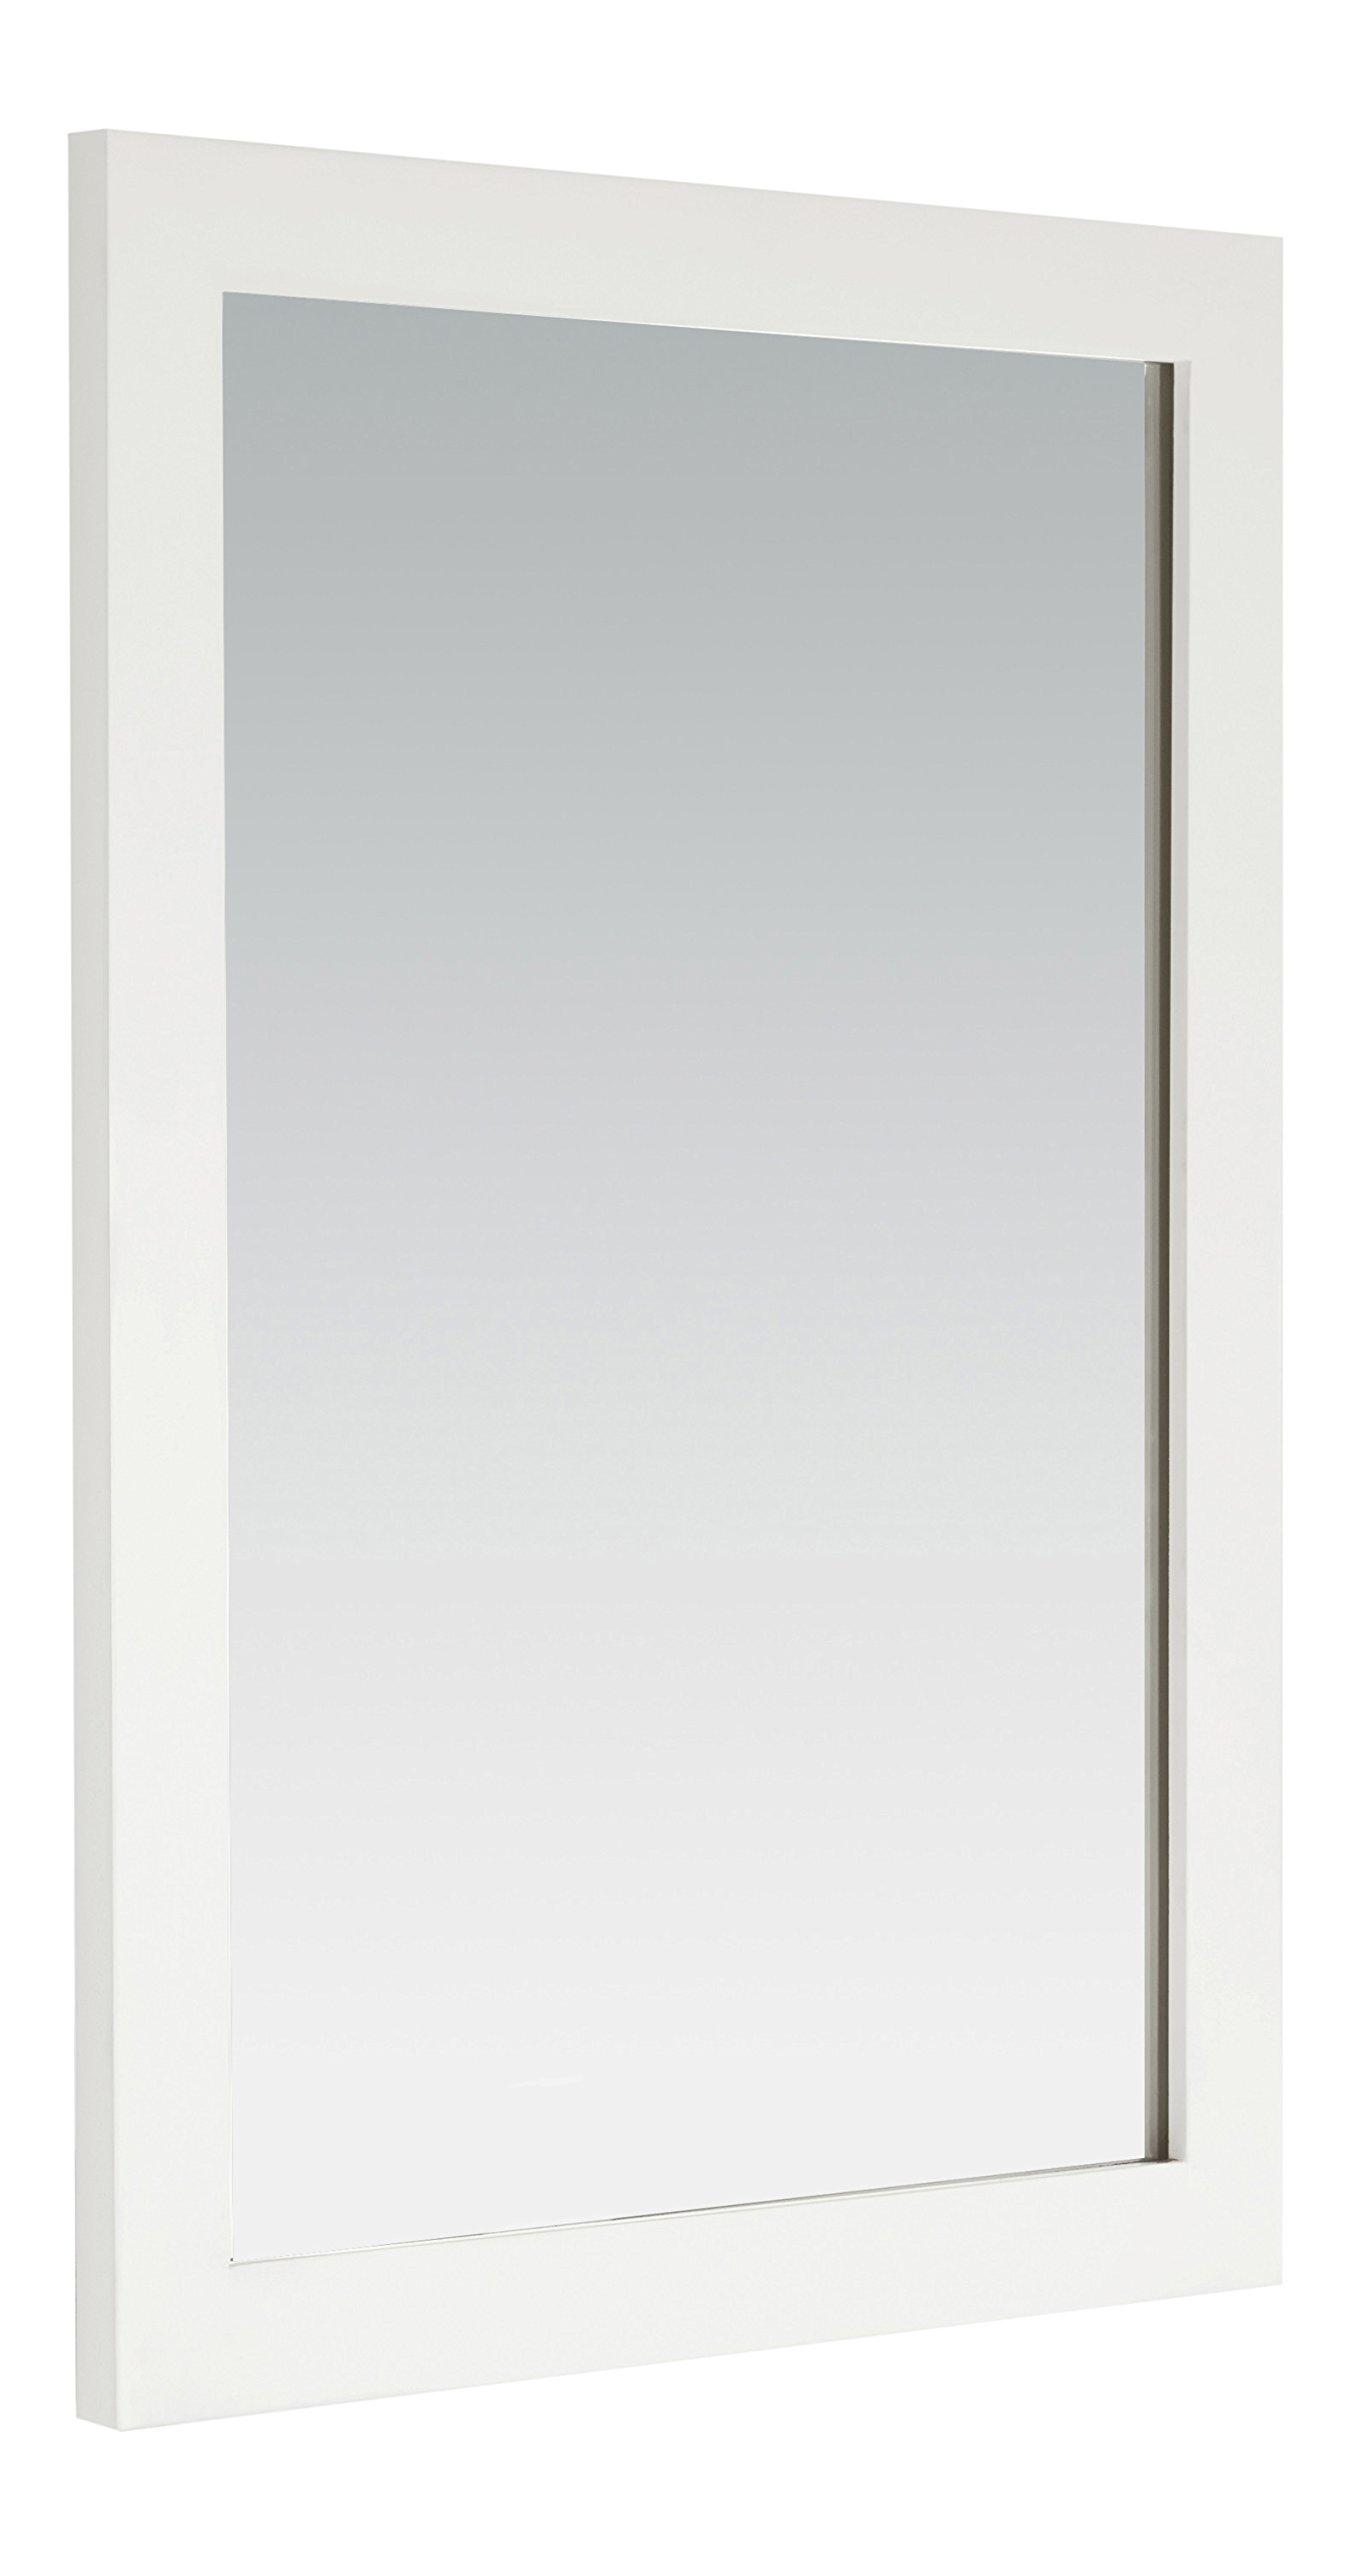 Simpli Home Cape Cod Bath Vanity Mirror, 22'' x 30'', Soft White